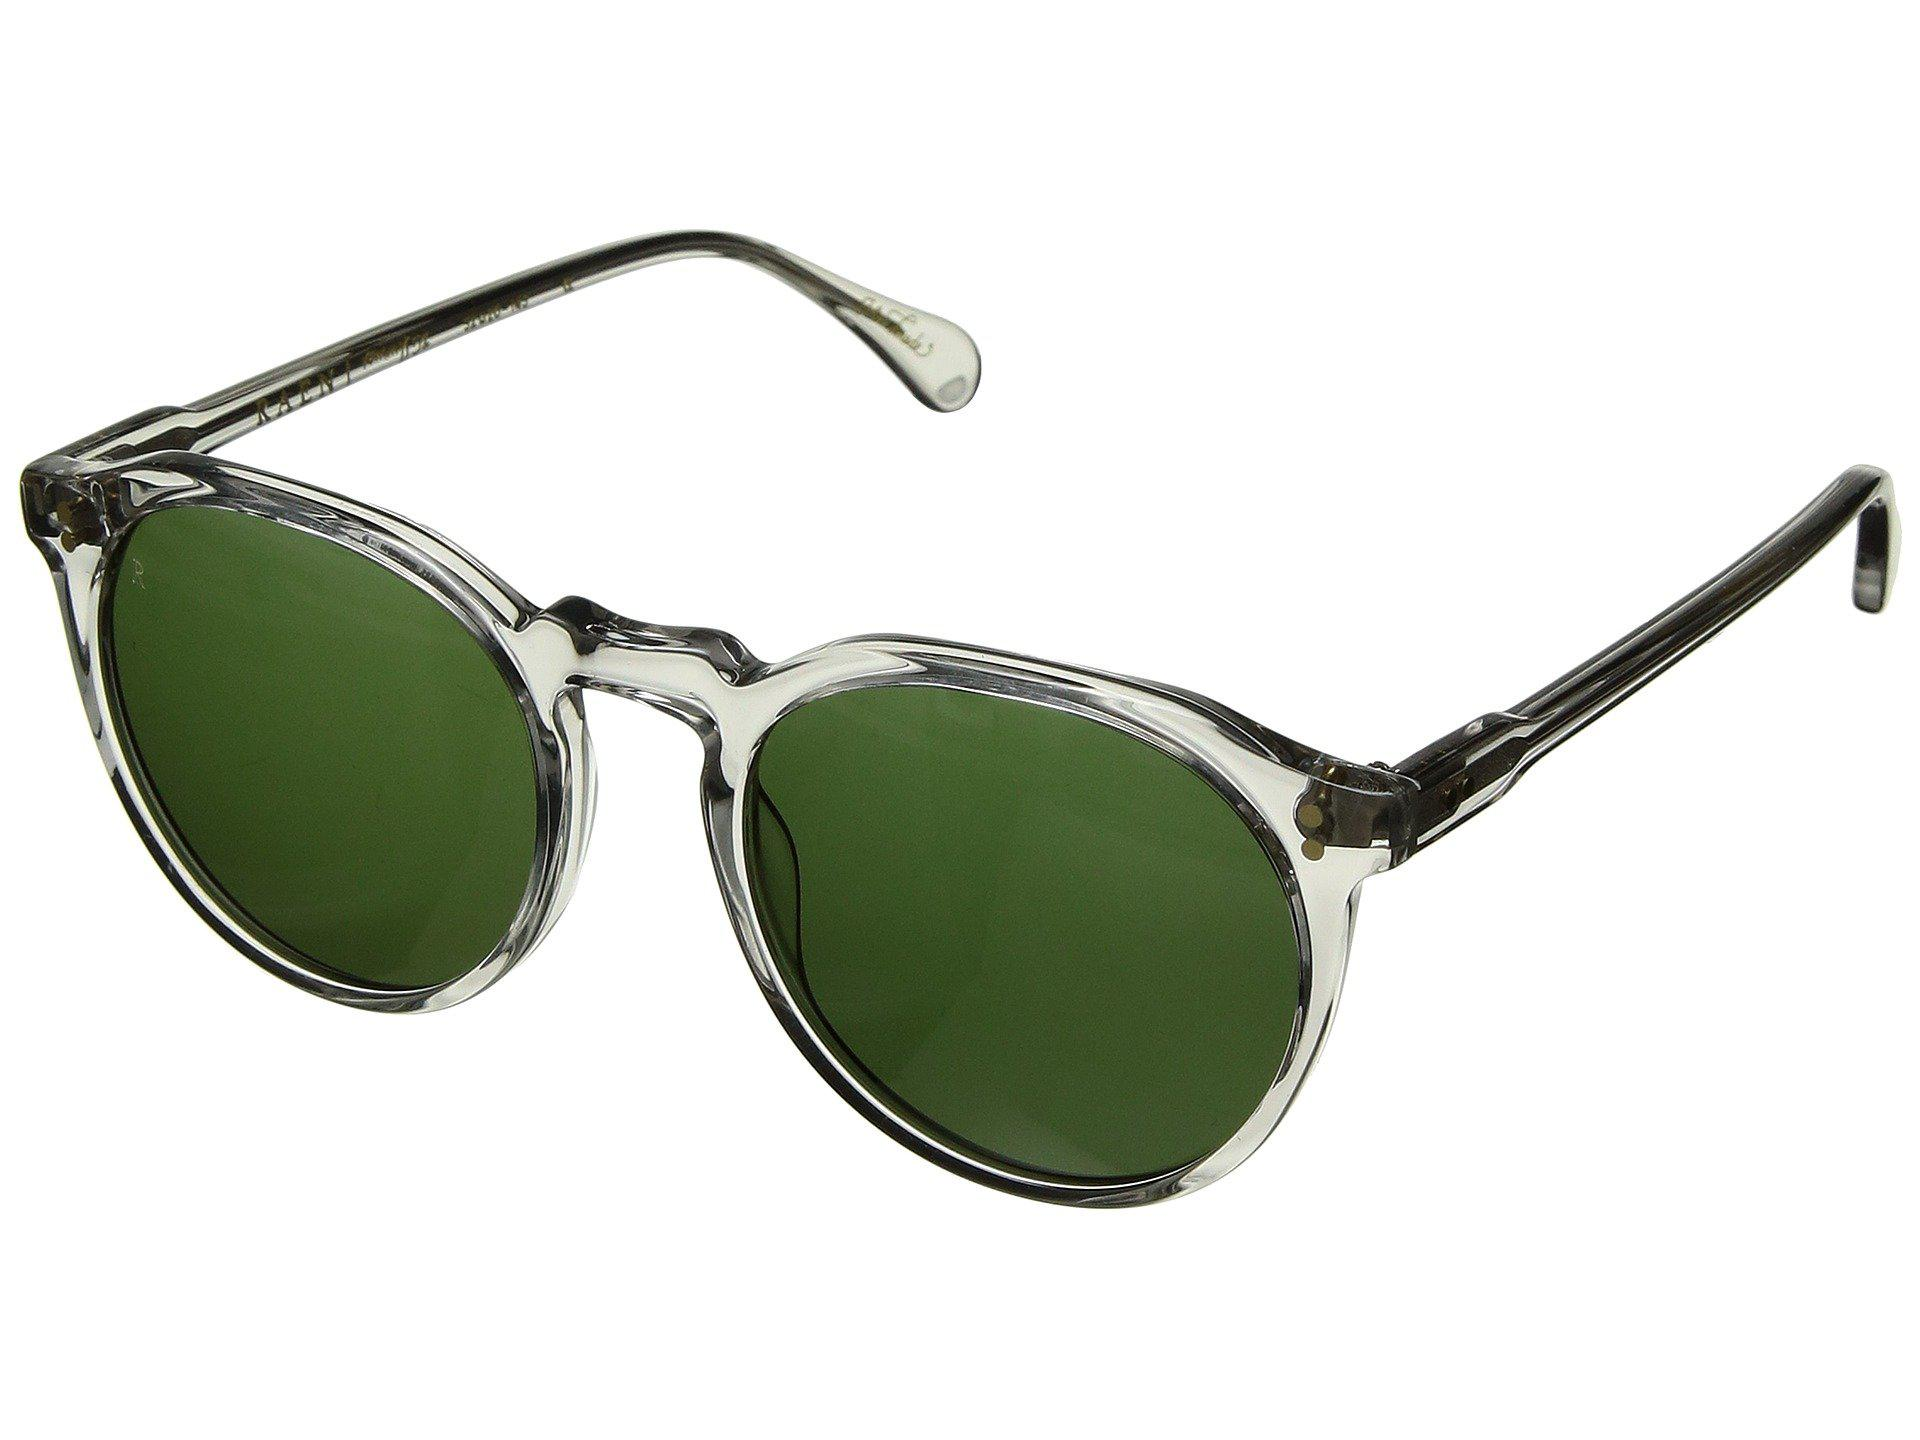 8a7cabf798 Lyst - Raen Remmy 52 (black tan Brown) Fashion Sunglasses in Green